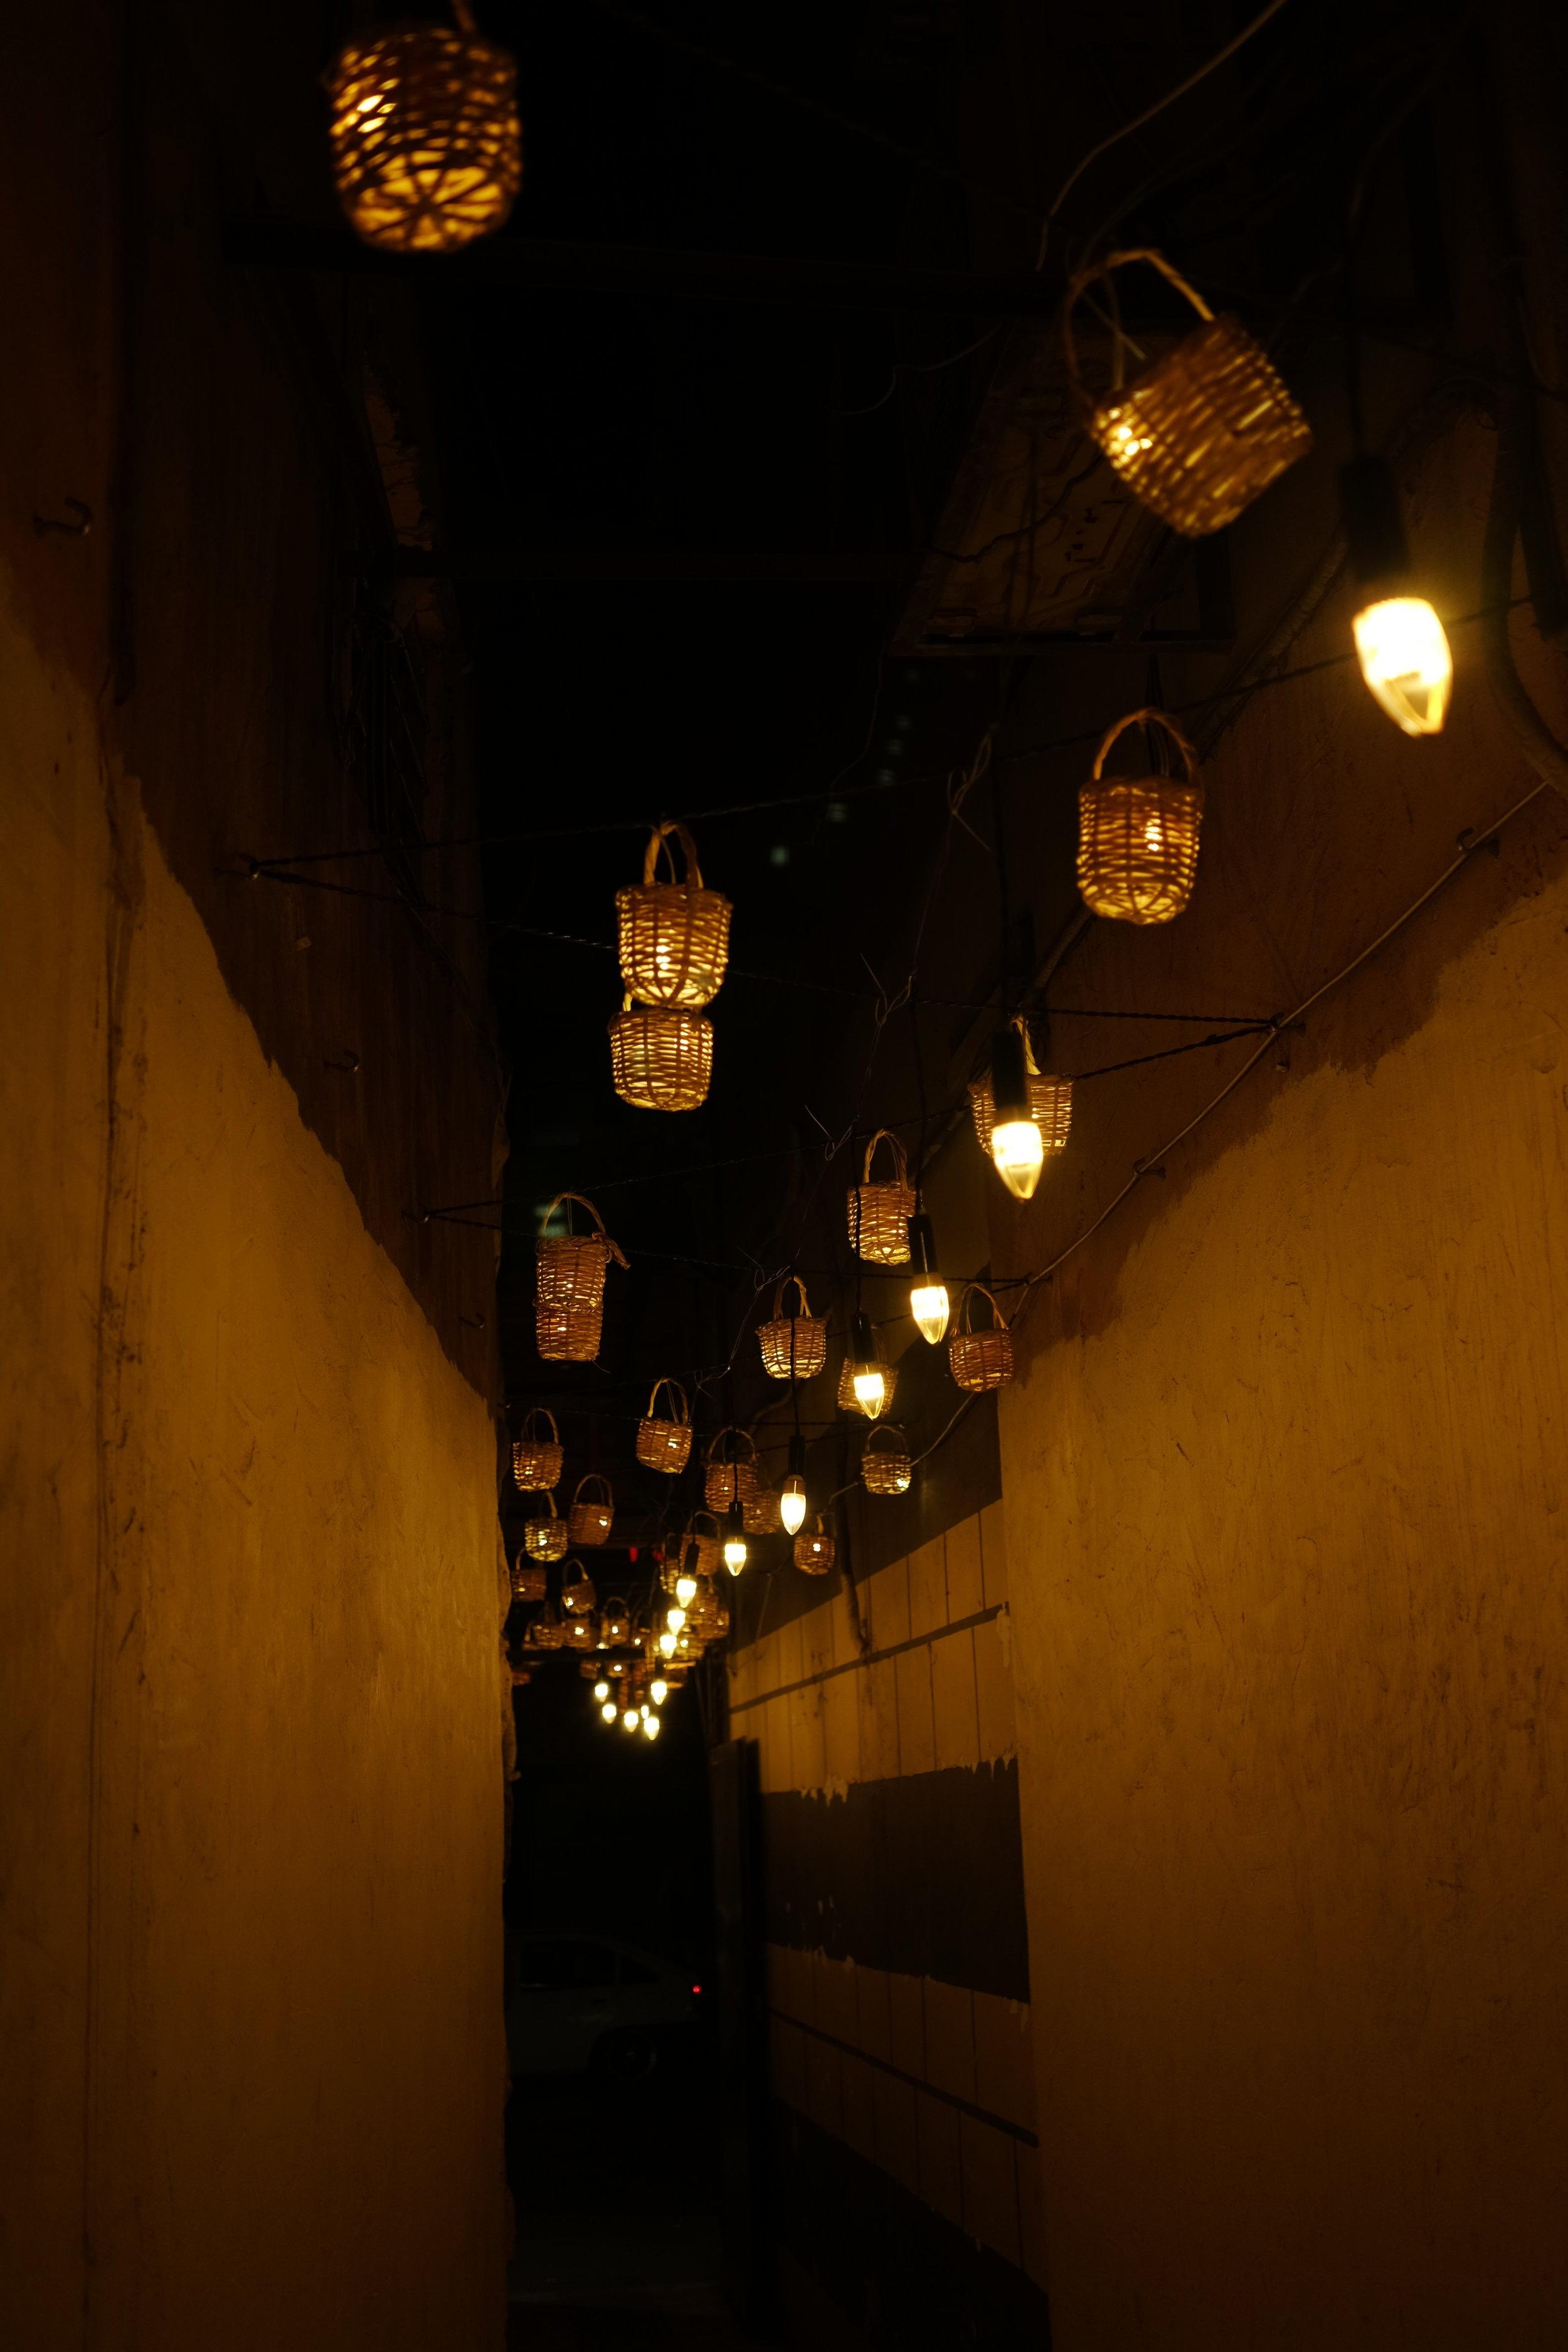 Night shot of an alleyway in Amman